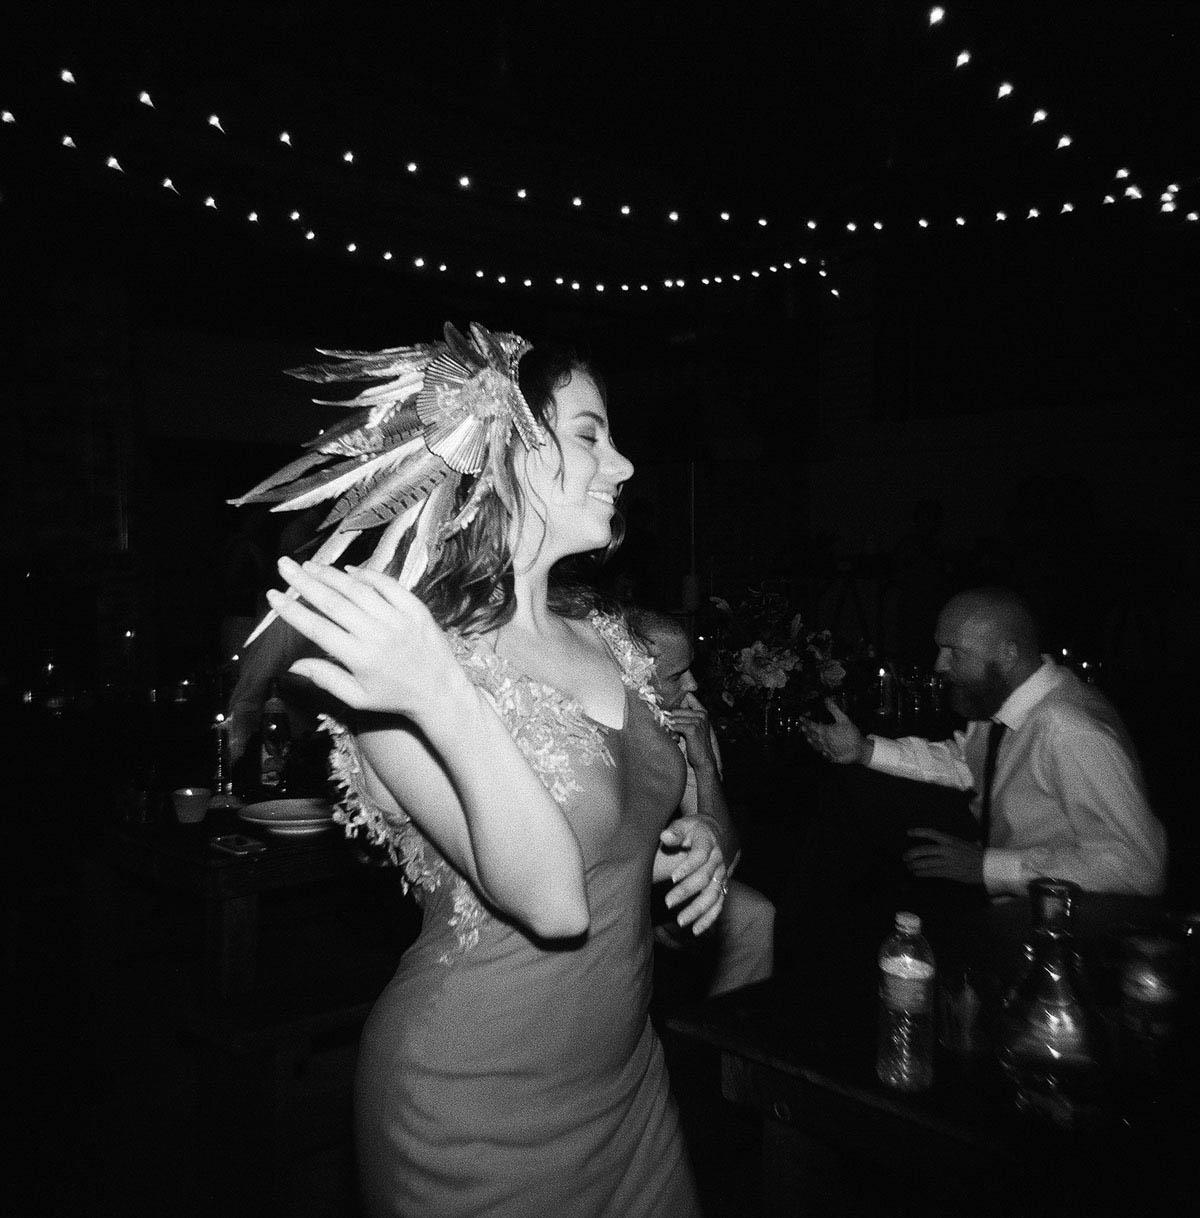 32-bride-dancing.jpg